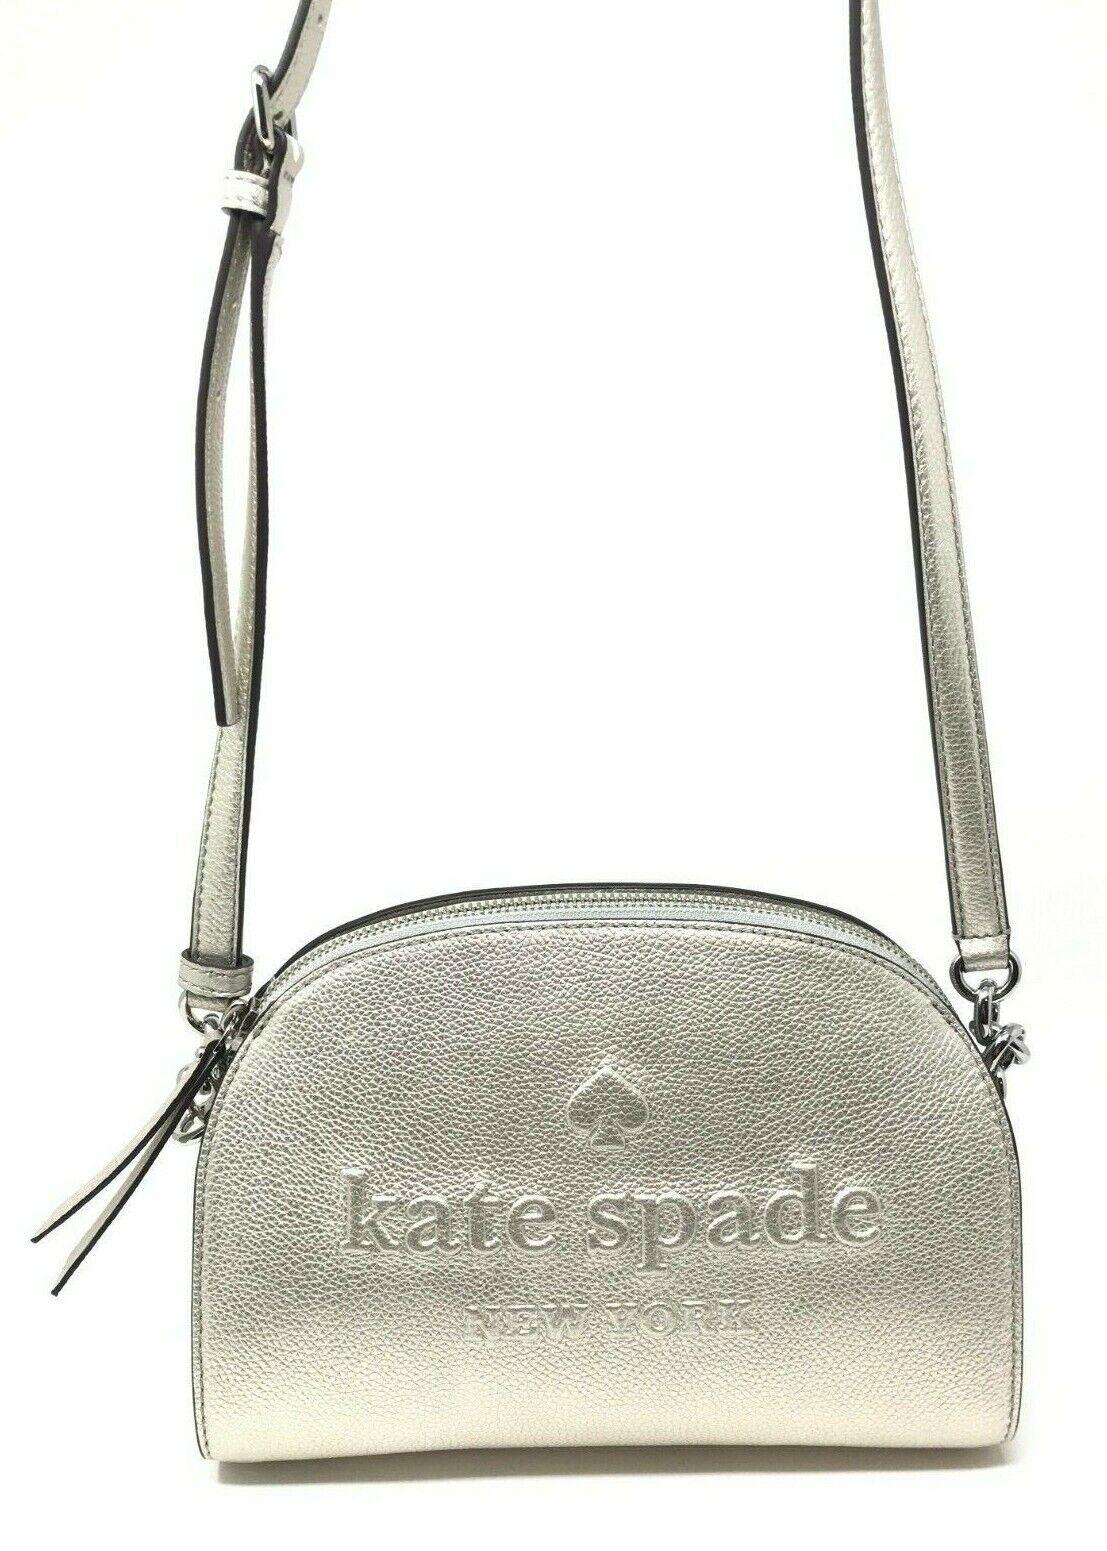 Kate Spade Larchmont Avenue Logo Tori Metallic Silver Crossbody Bag